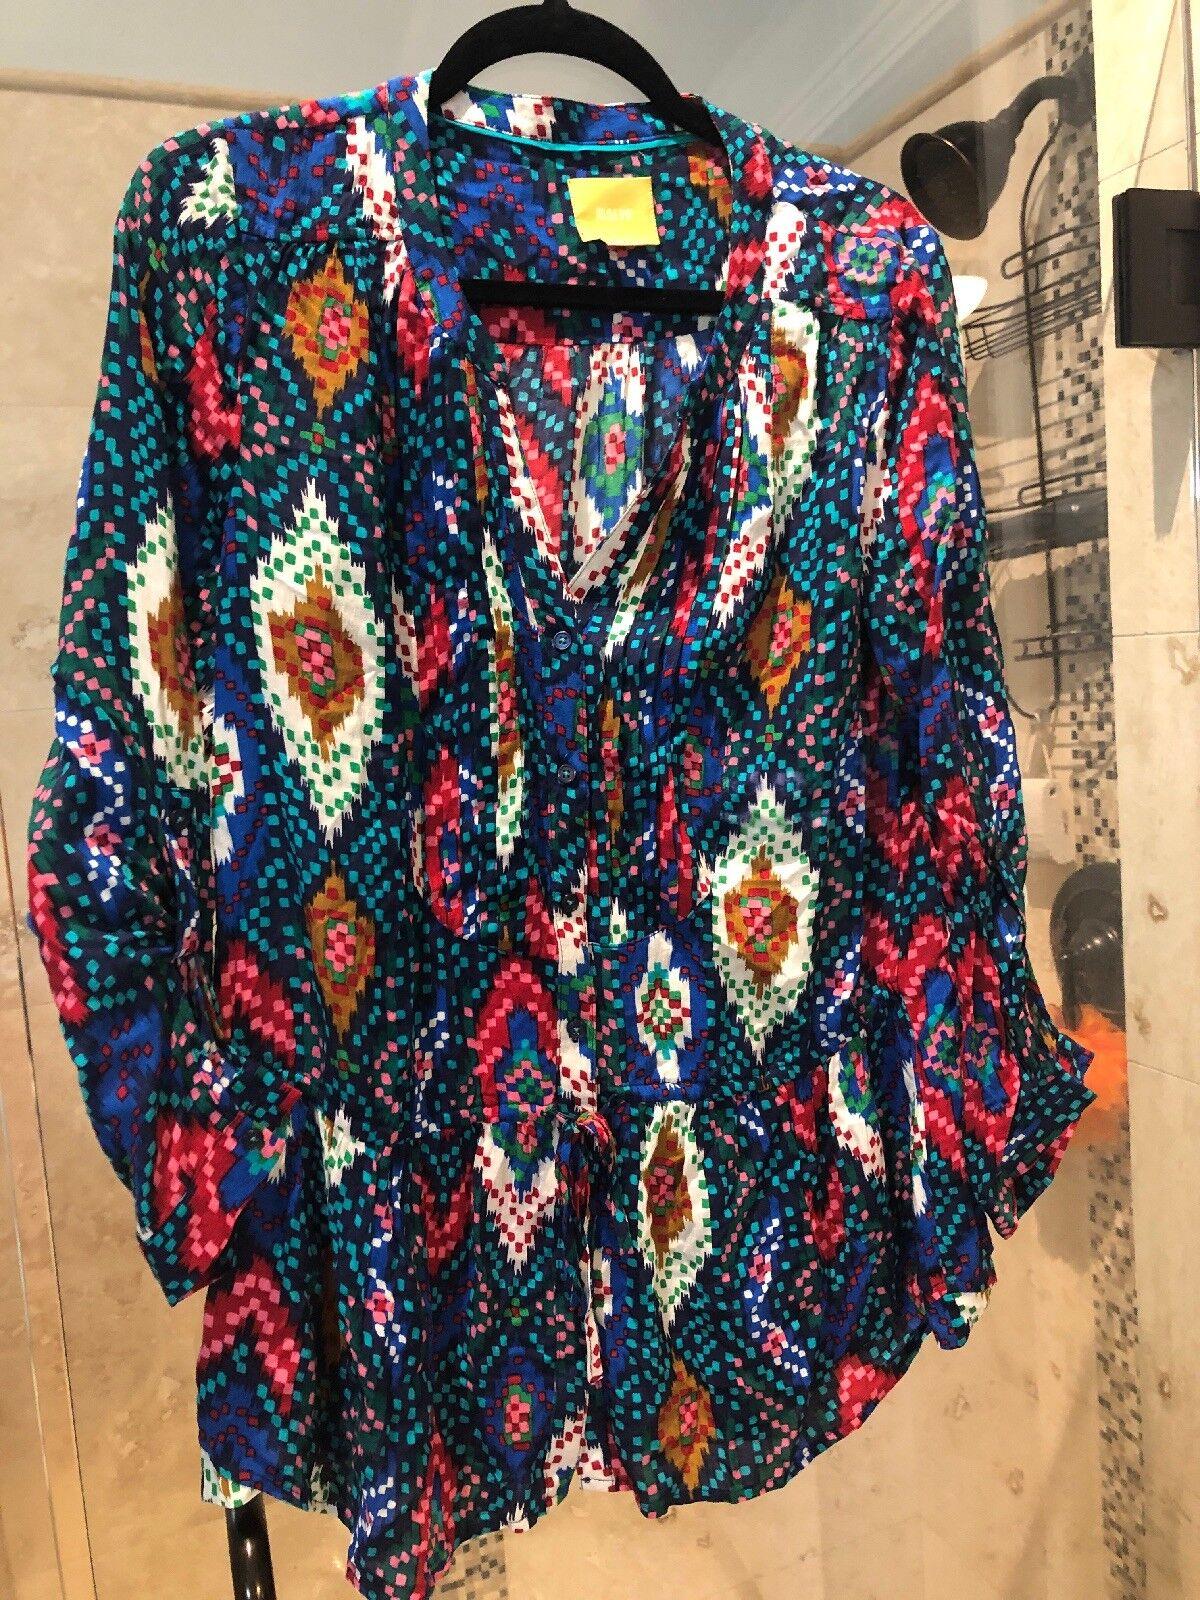 Maeve Anthropologie damen Peplum Top Blouse Tunic Blau Rosa rot Azte Sz 6 Small